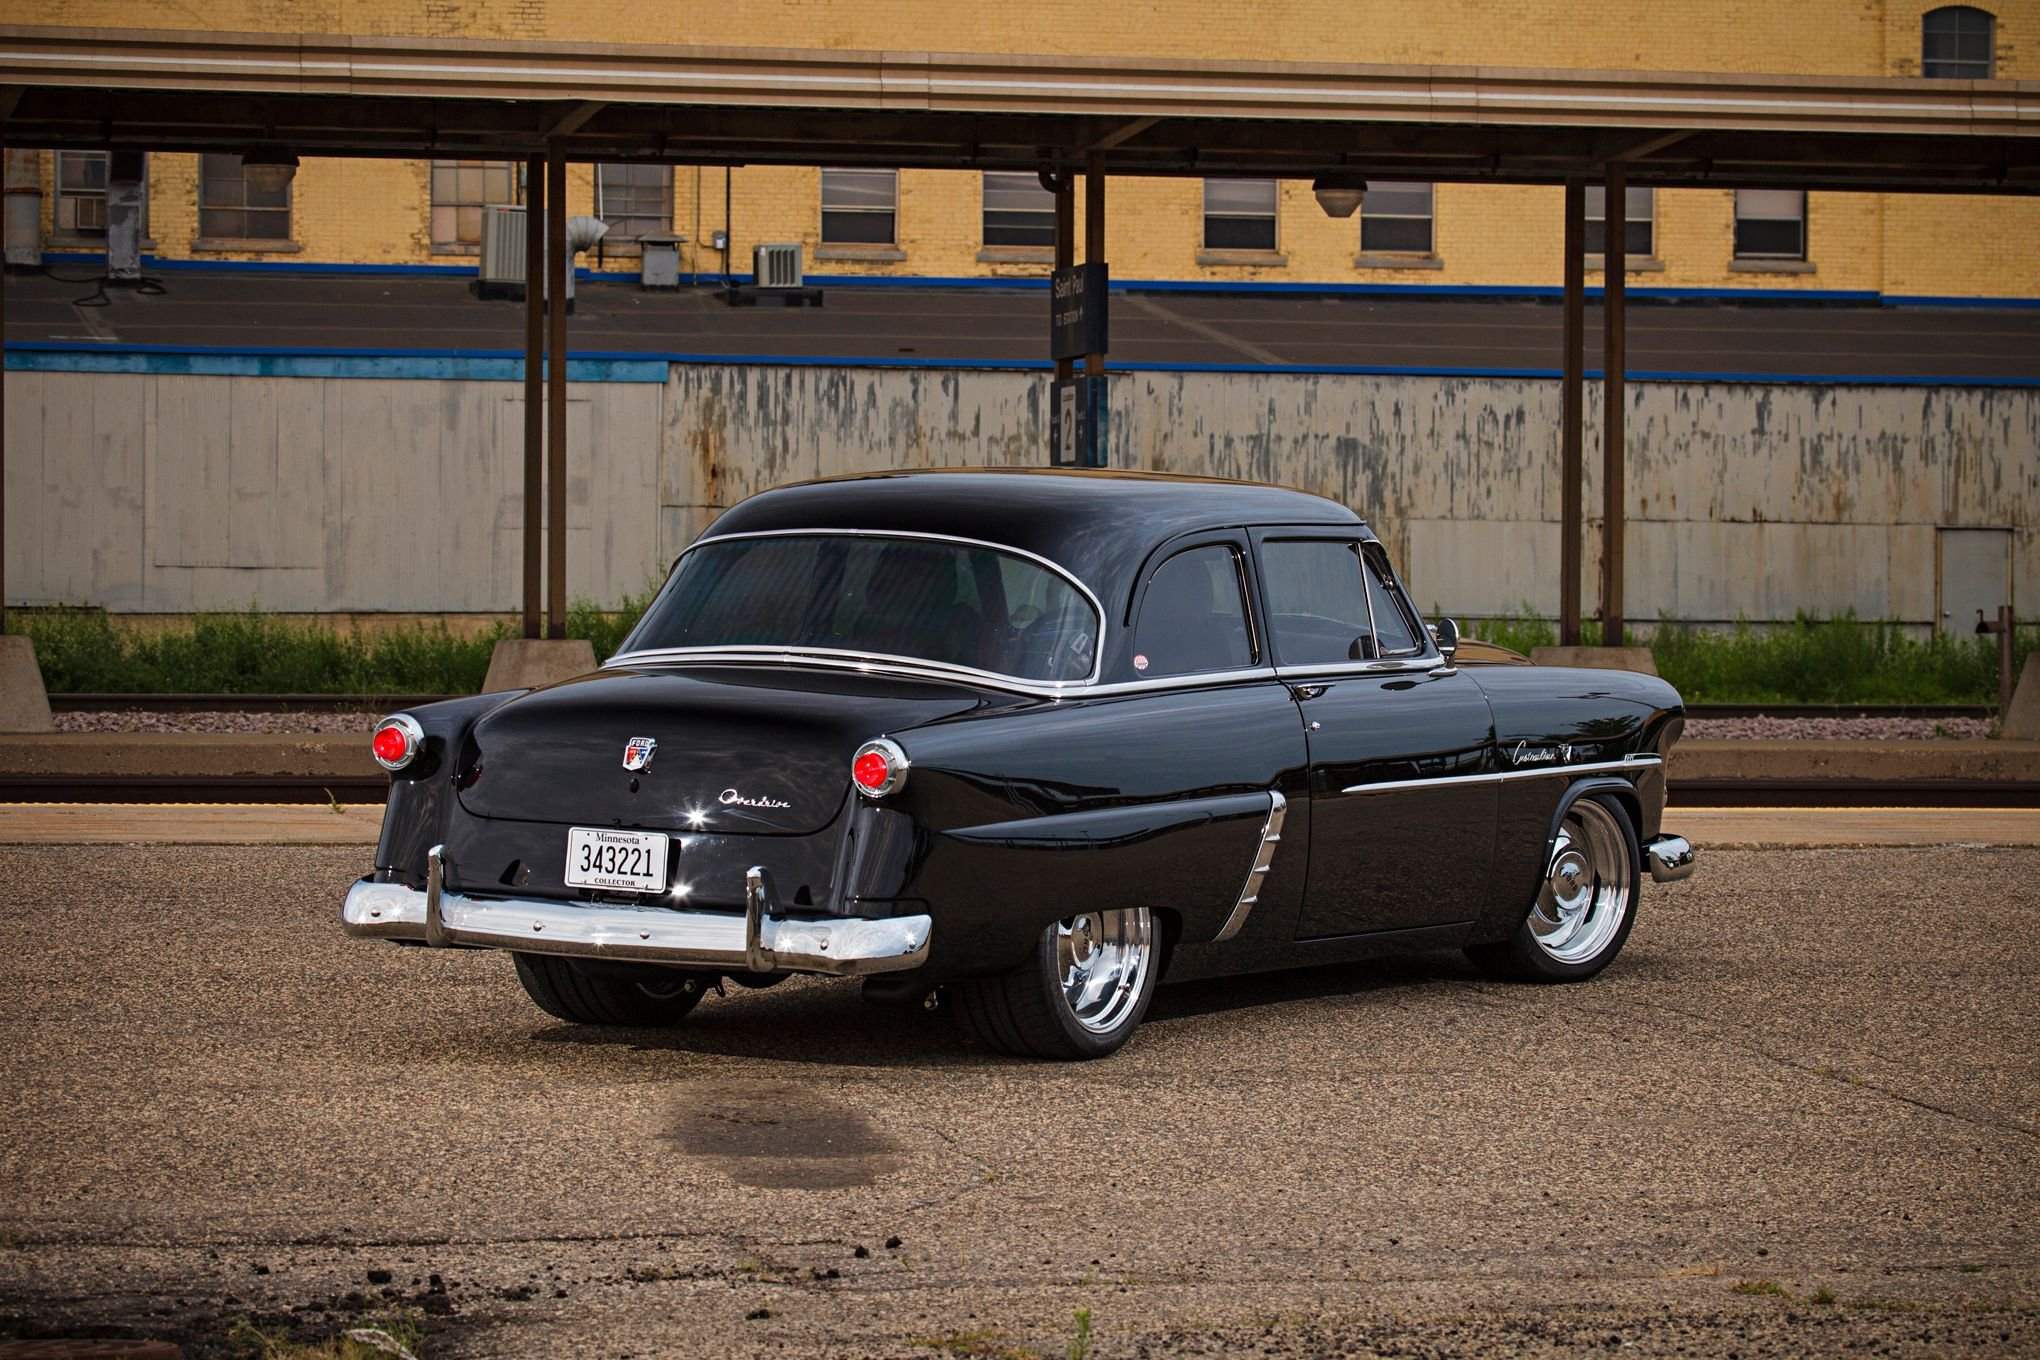 1952 Ford Customline Sedan Two Door Streetrod Street Rod Rodder 1951 Hot Truck Pics Black Usa 2040x1360 03 Wallpaper 673022 Wallpaperup